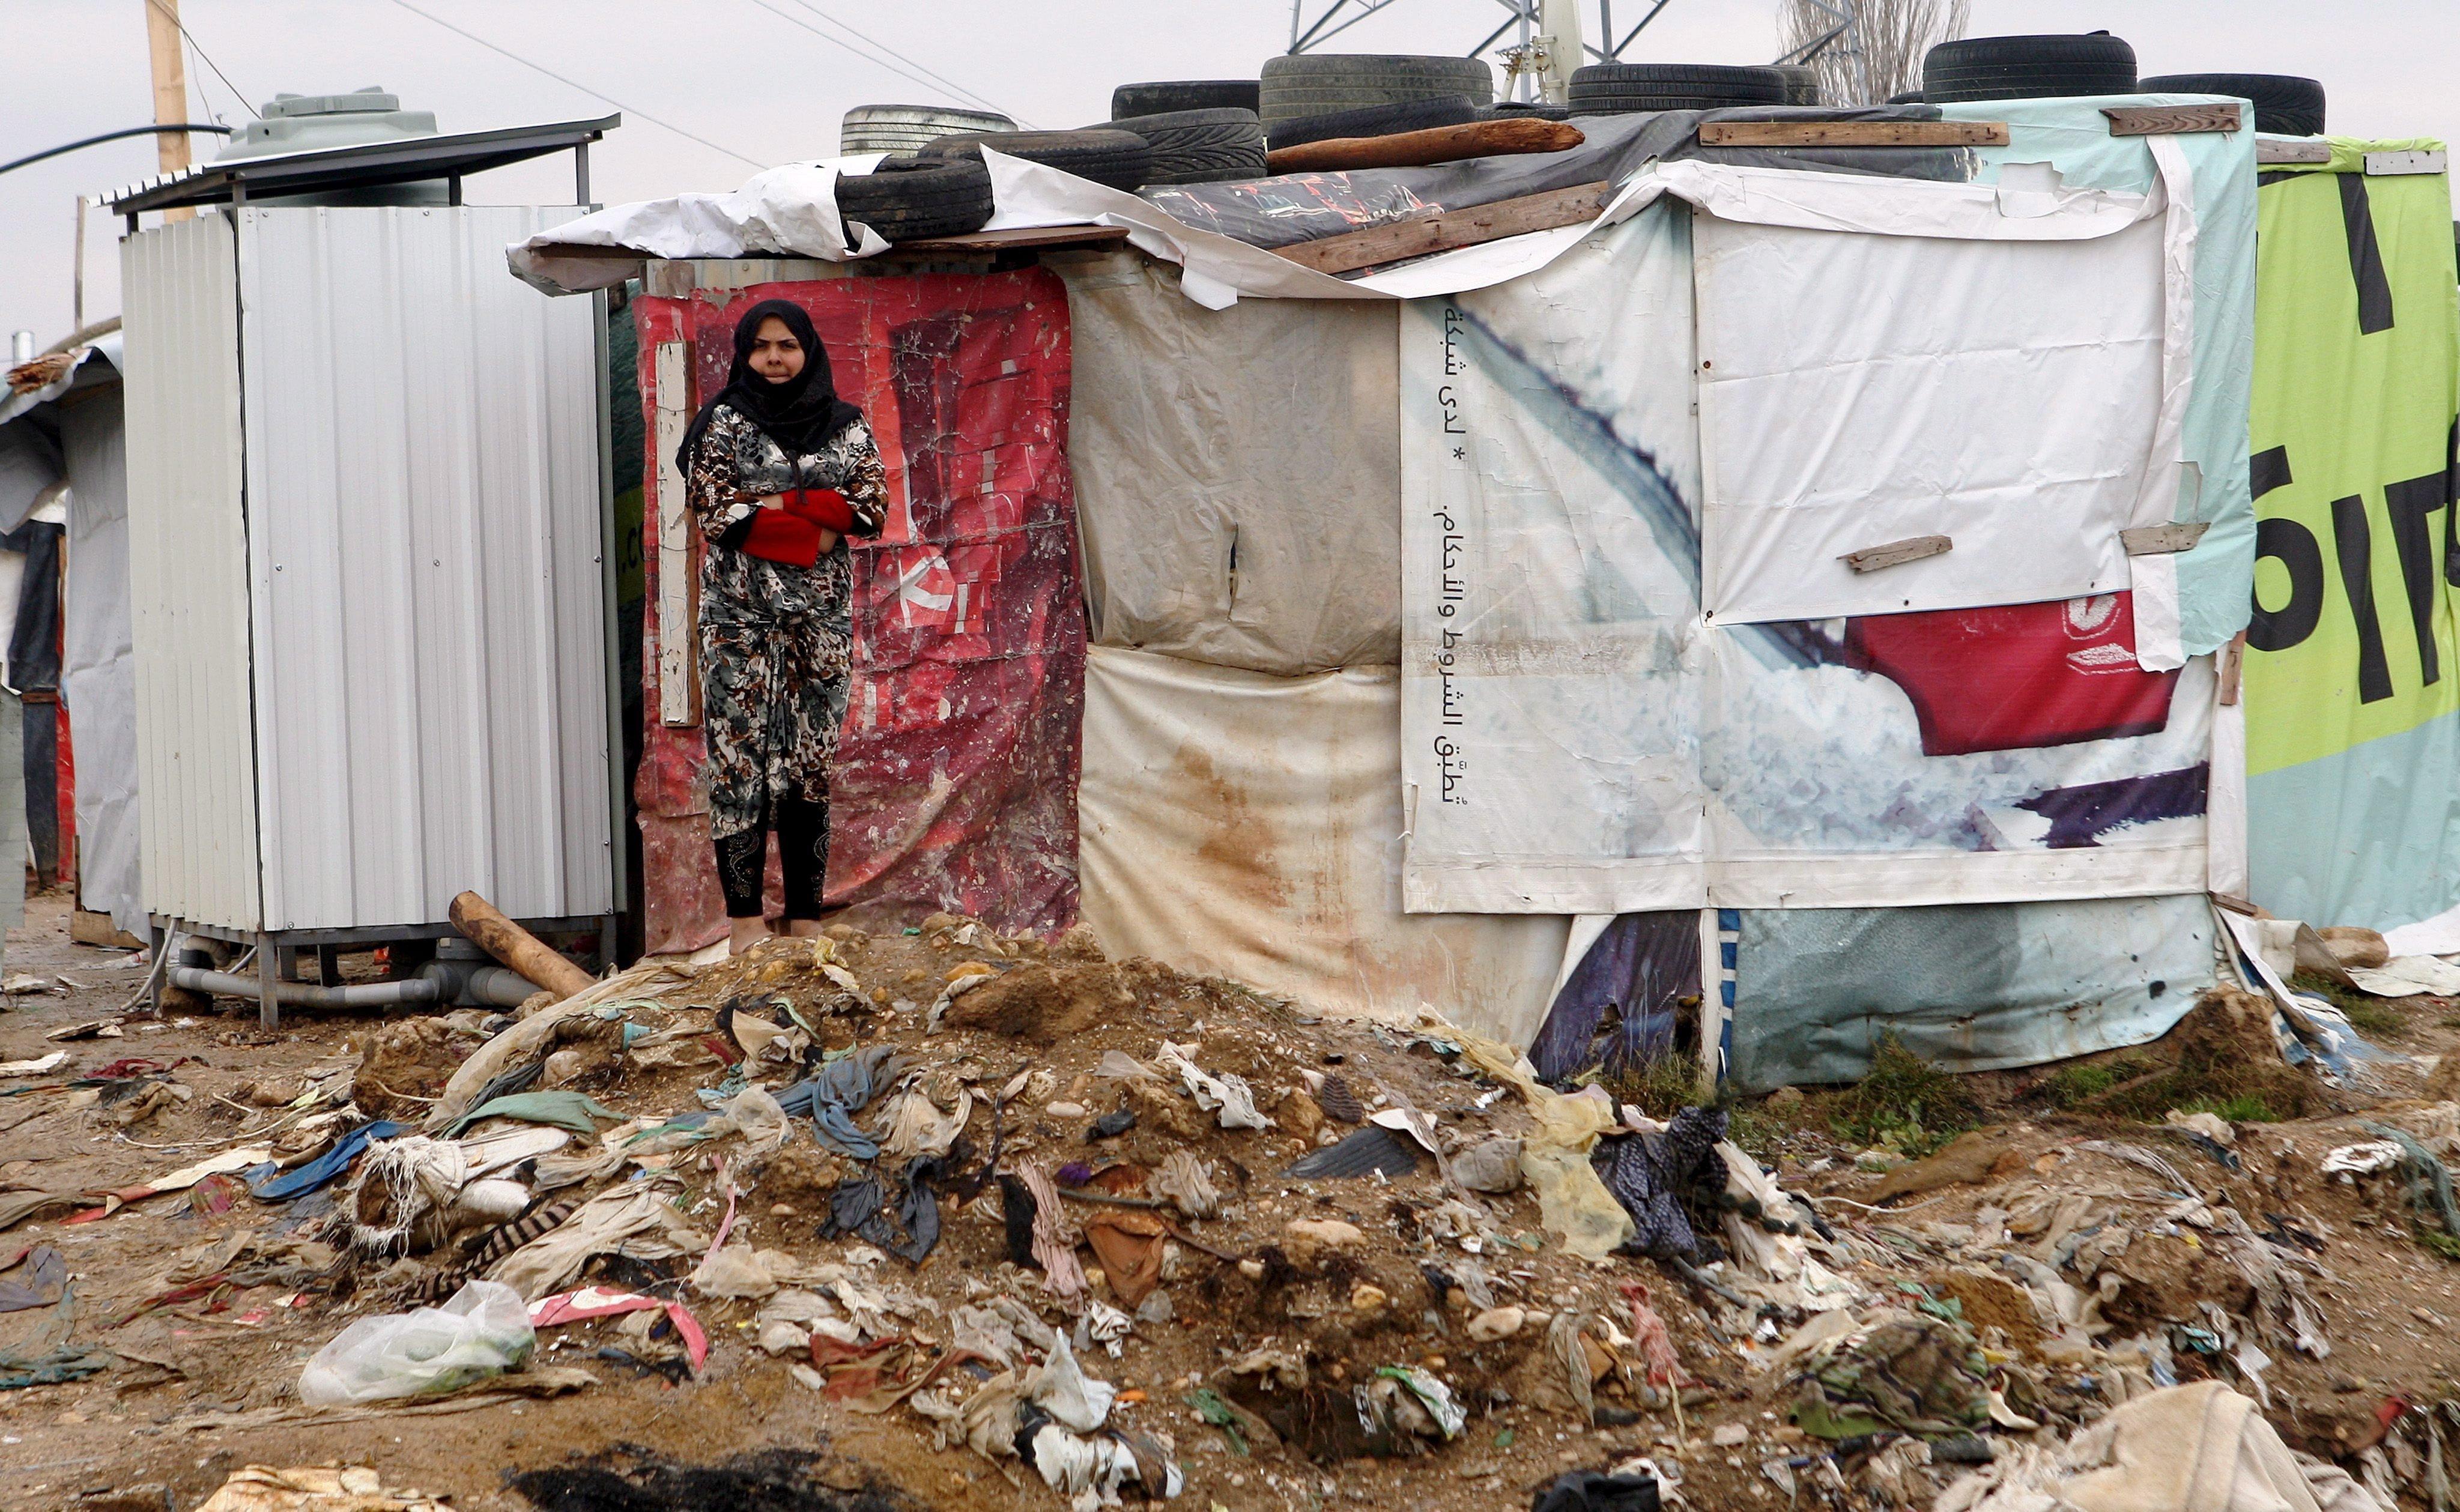 libanoni menekülttábor